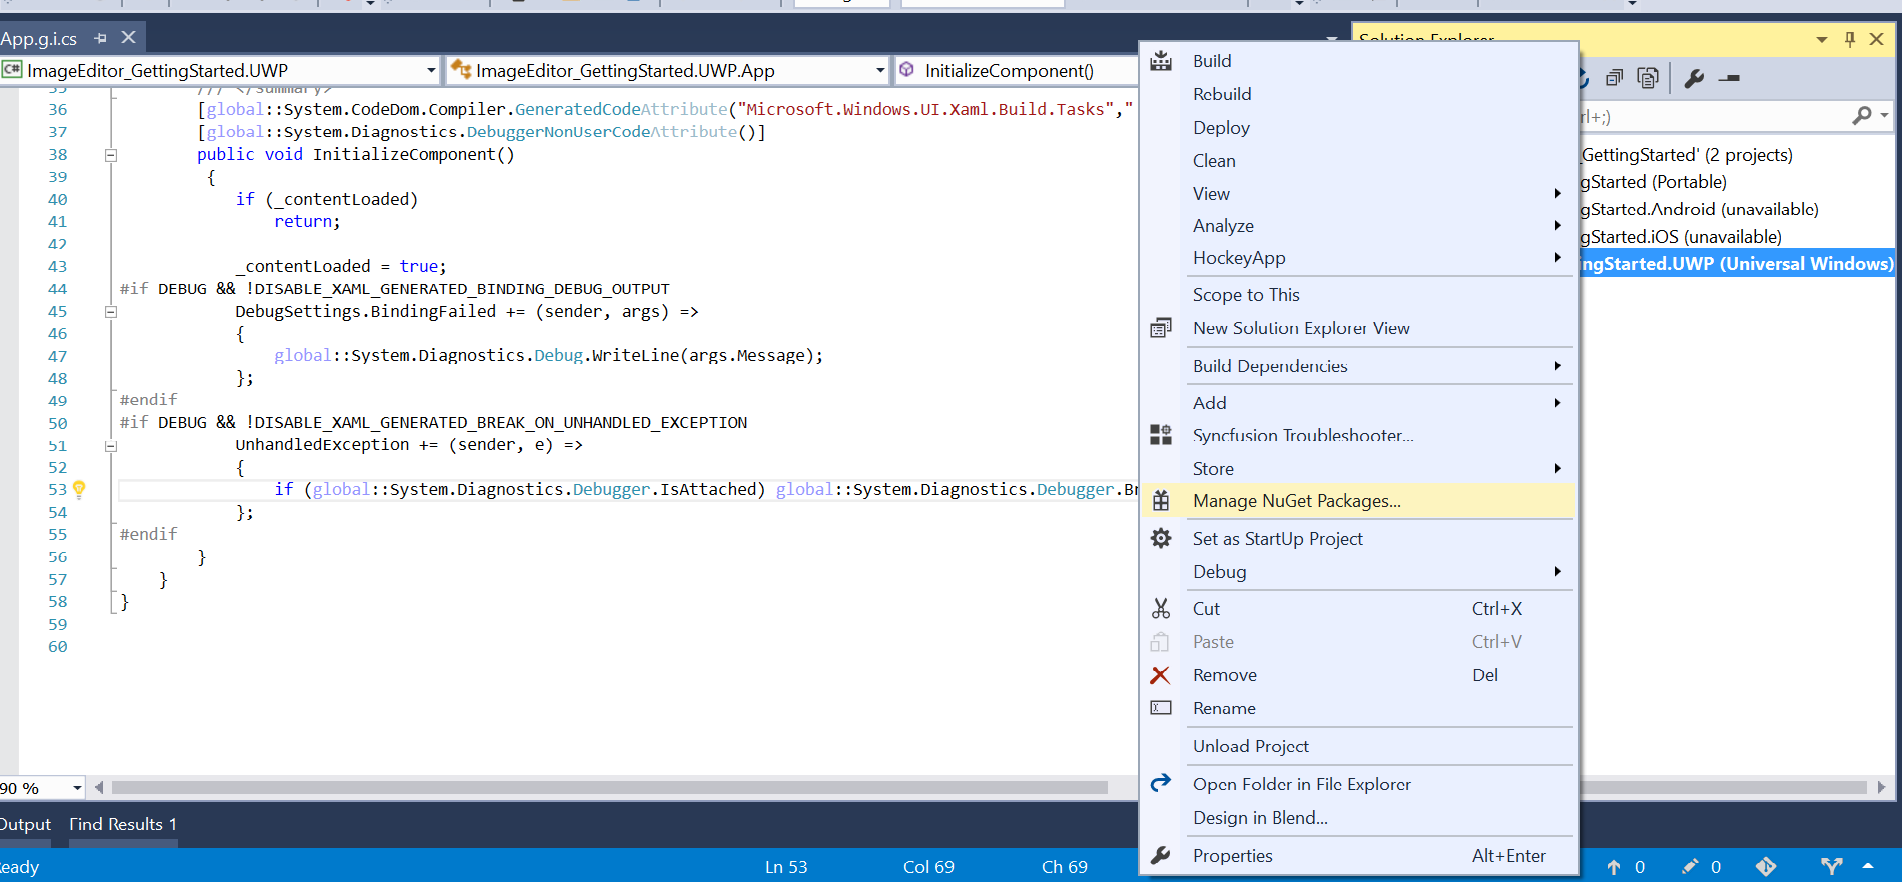 C:\Users\samkumar.arivazhagan\AppData\Local\Microsoft\Windows\INetCache\Content.Word\Manage Nuget Package.png